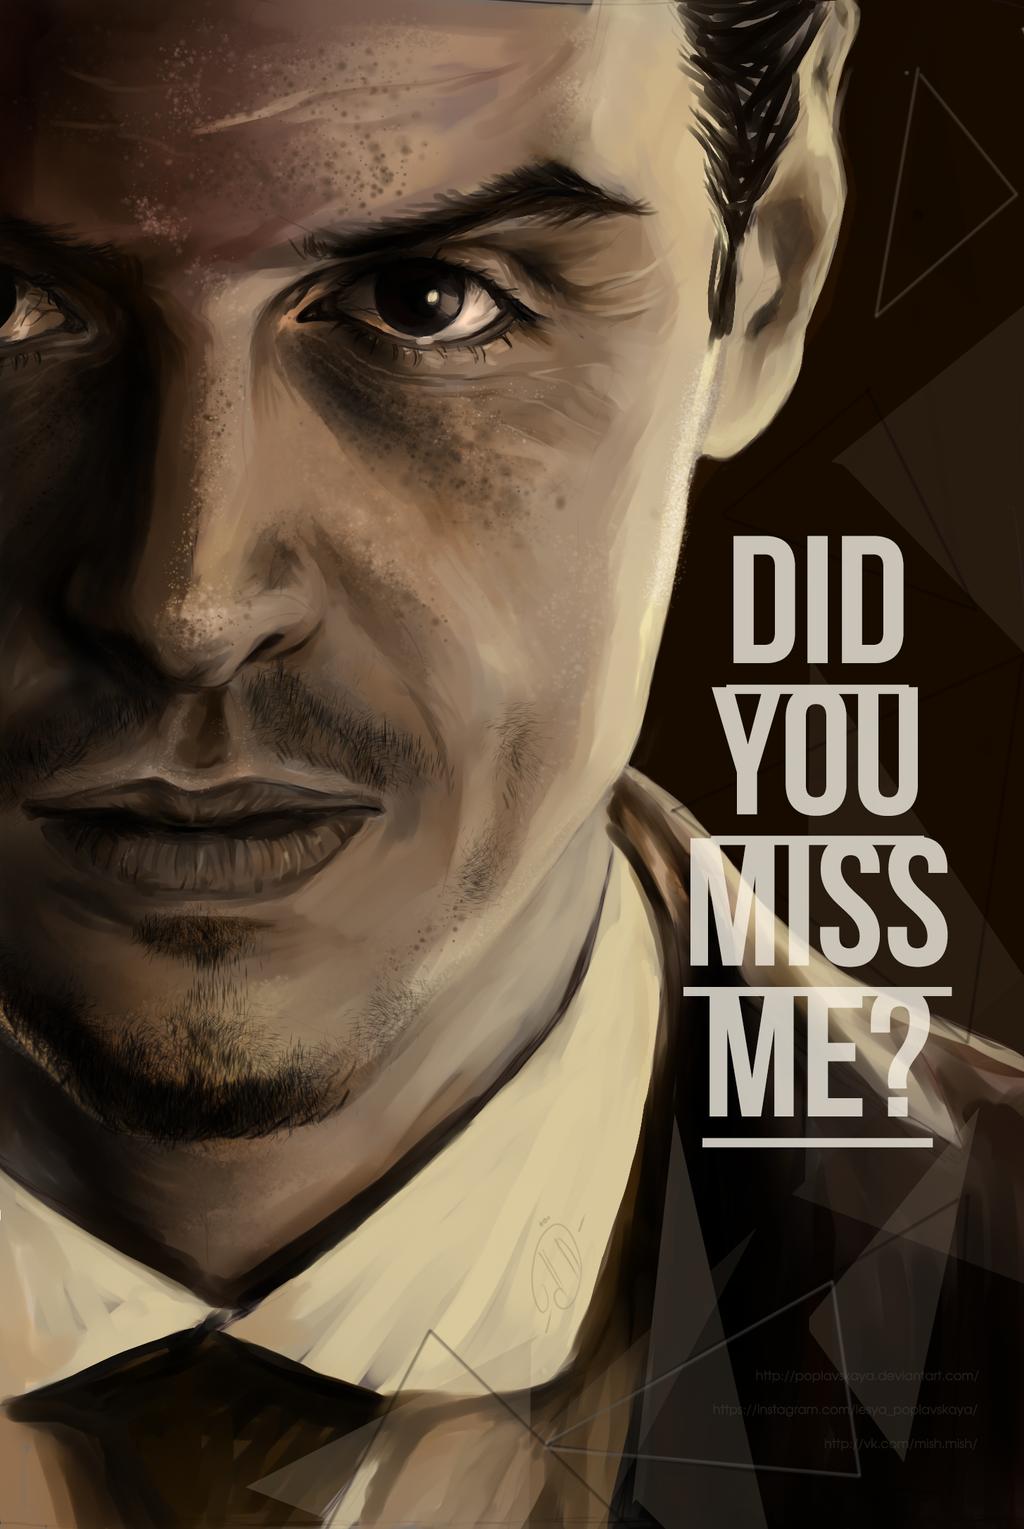 DID YOU MISS ME|Moriarty by Poplavskaya on DeviantArt